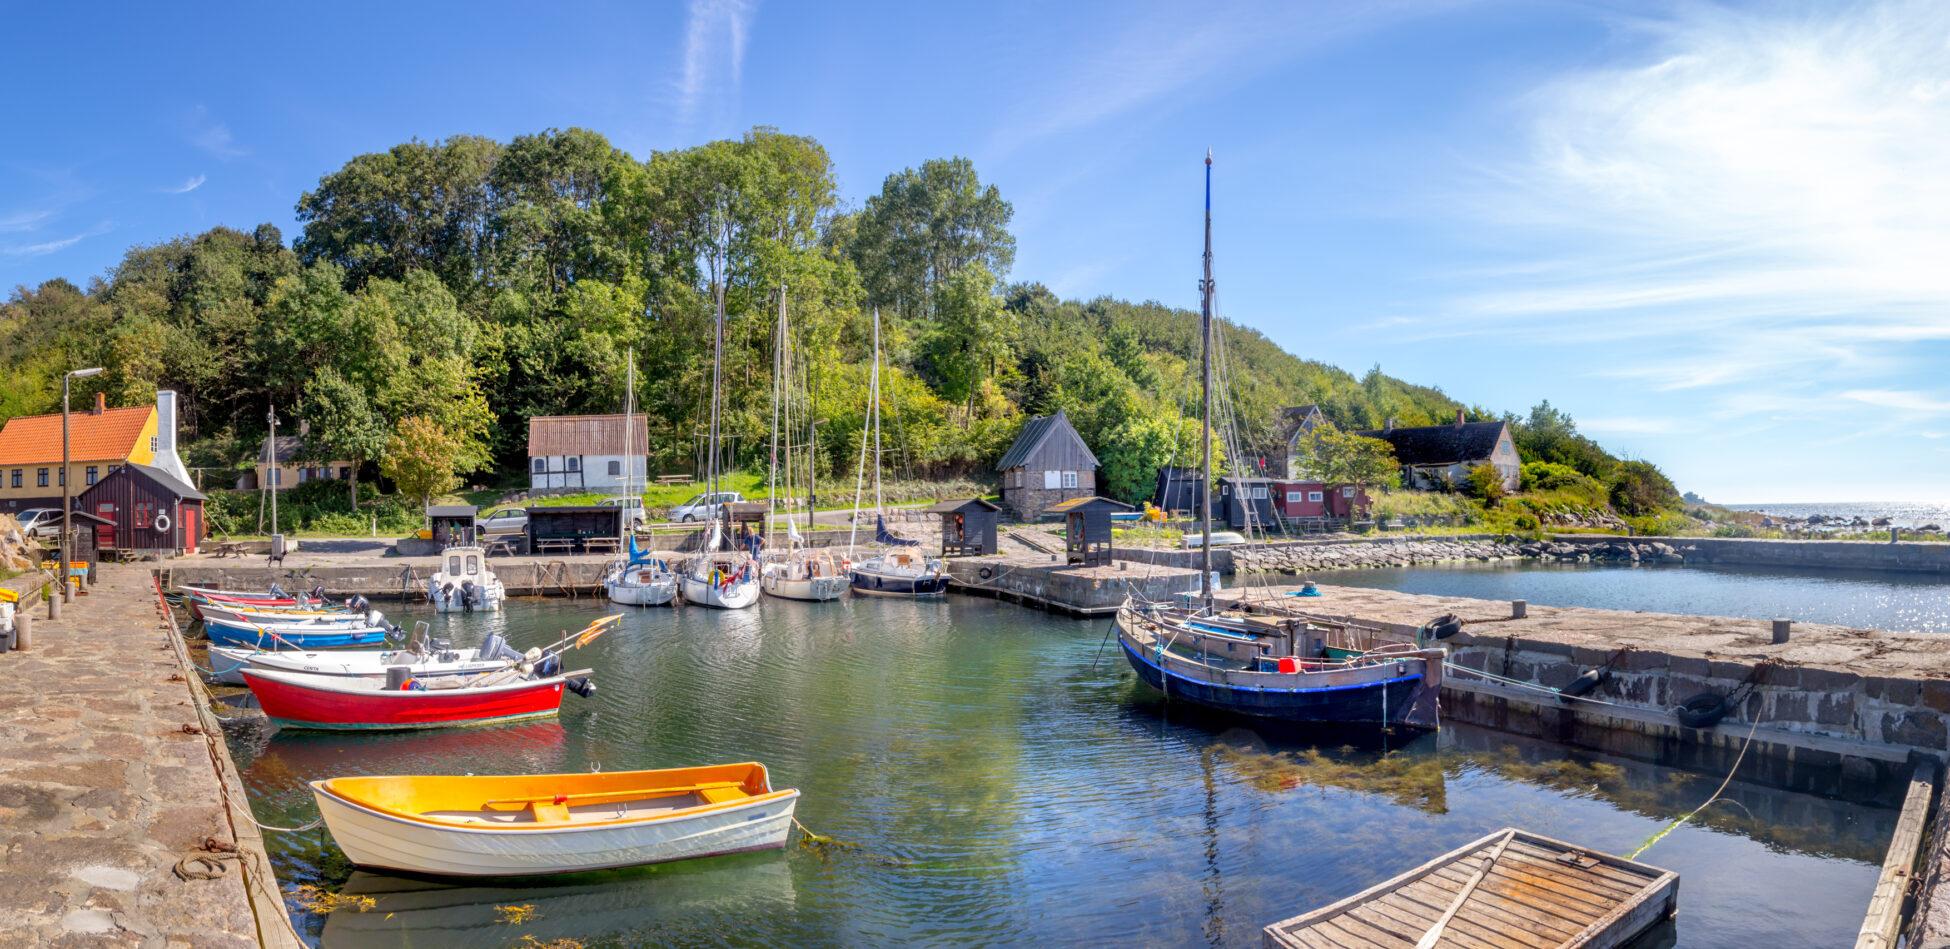 Hemmelige steder på Bornholm